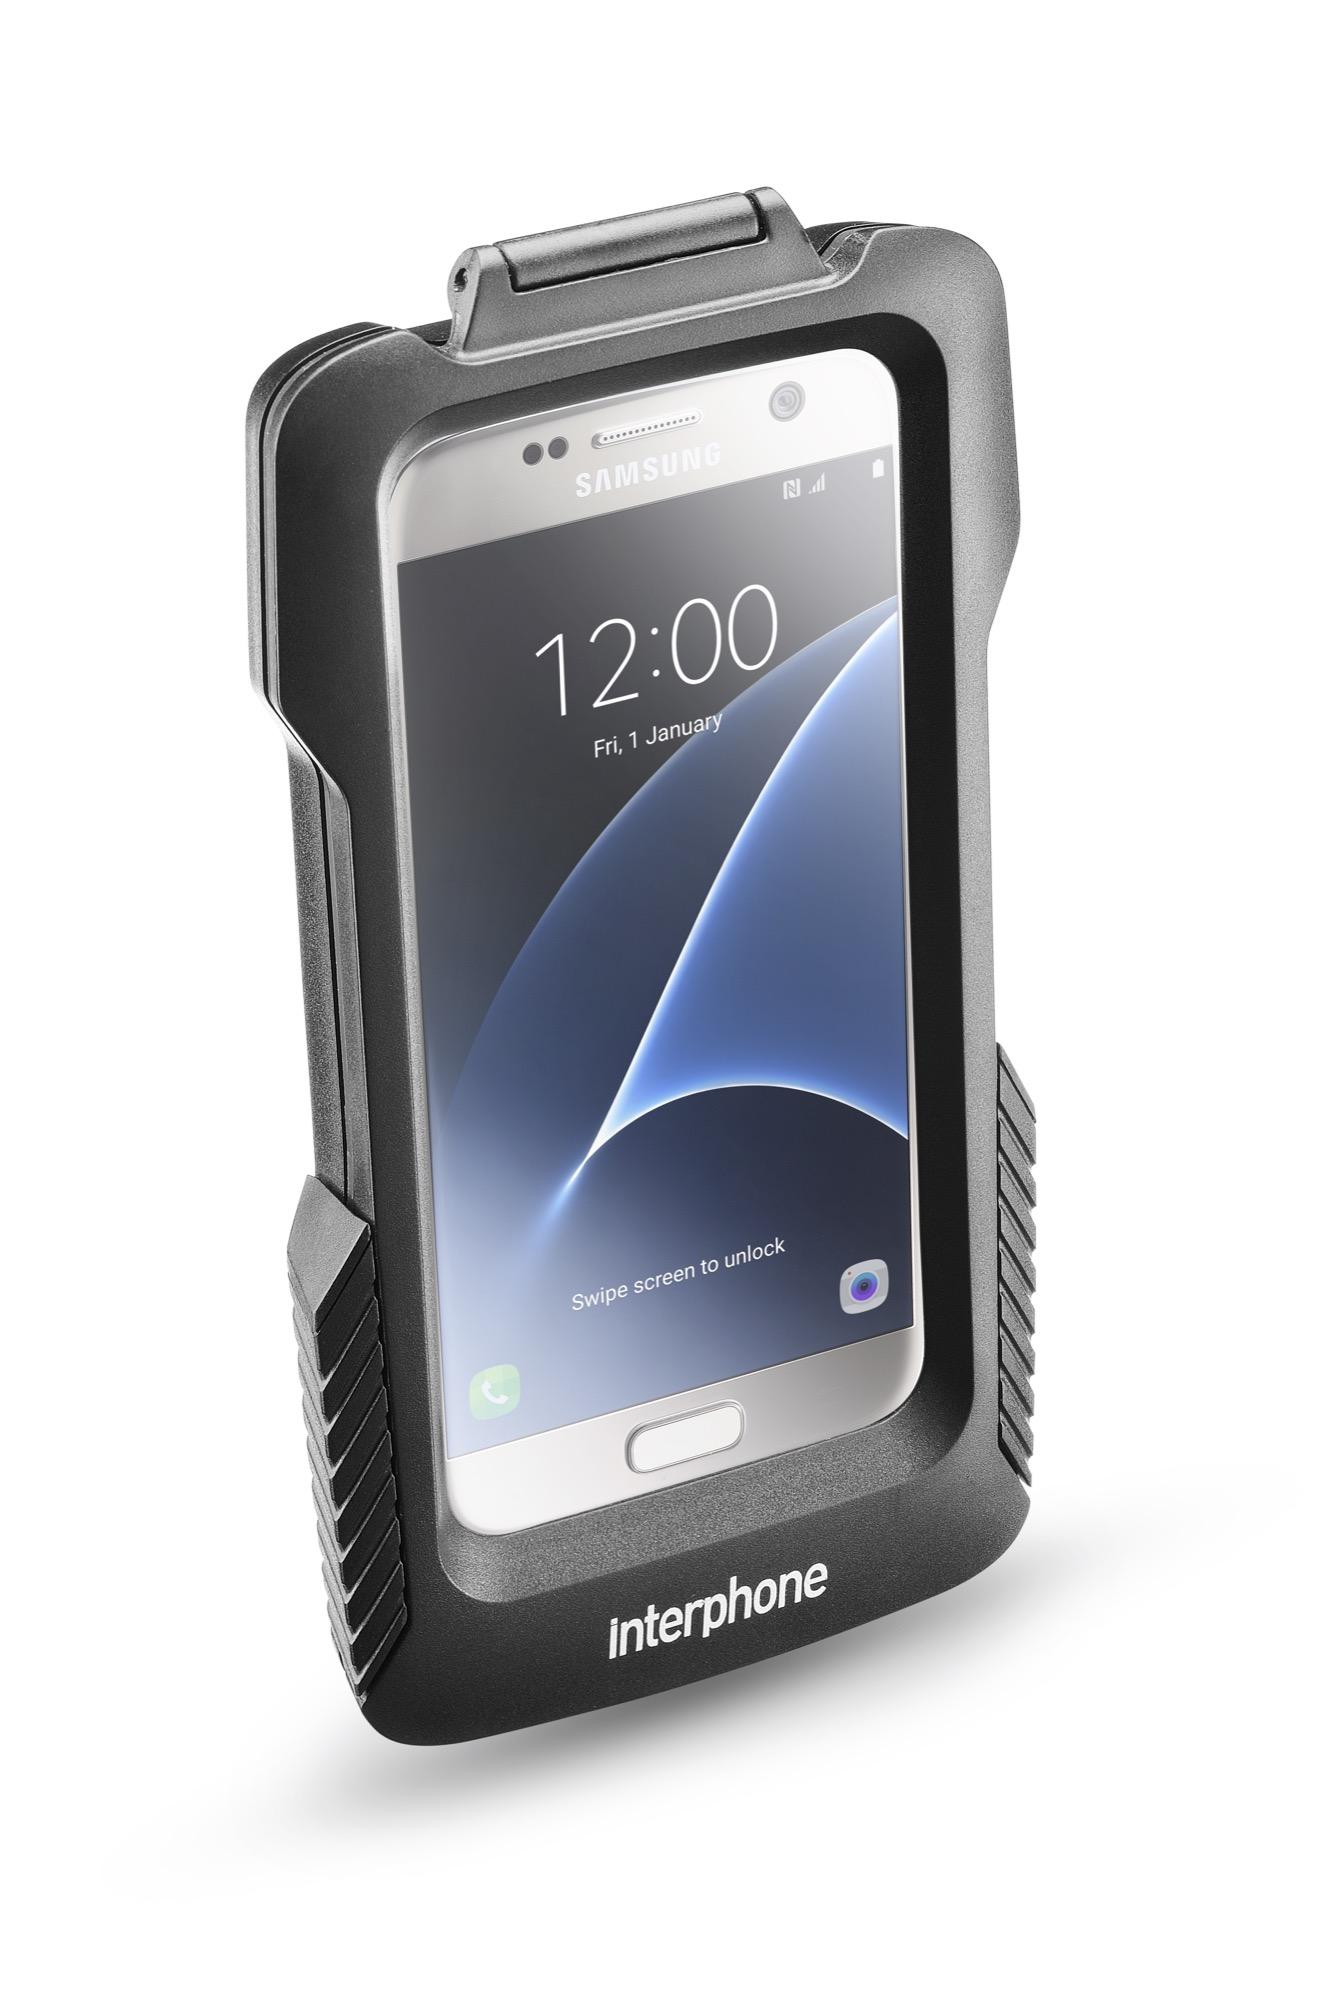 Держатель Interphone Samsung Galaxy S7/S6/S6 EDGE на нетрубчатый руль мотоцикла, скутера SSCGALAXY6